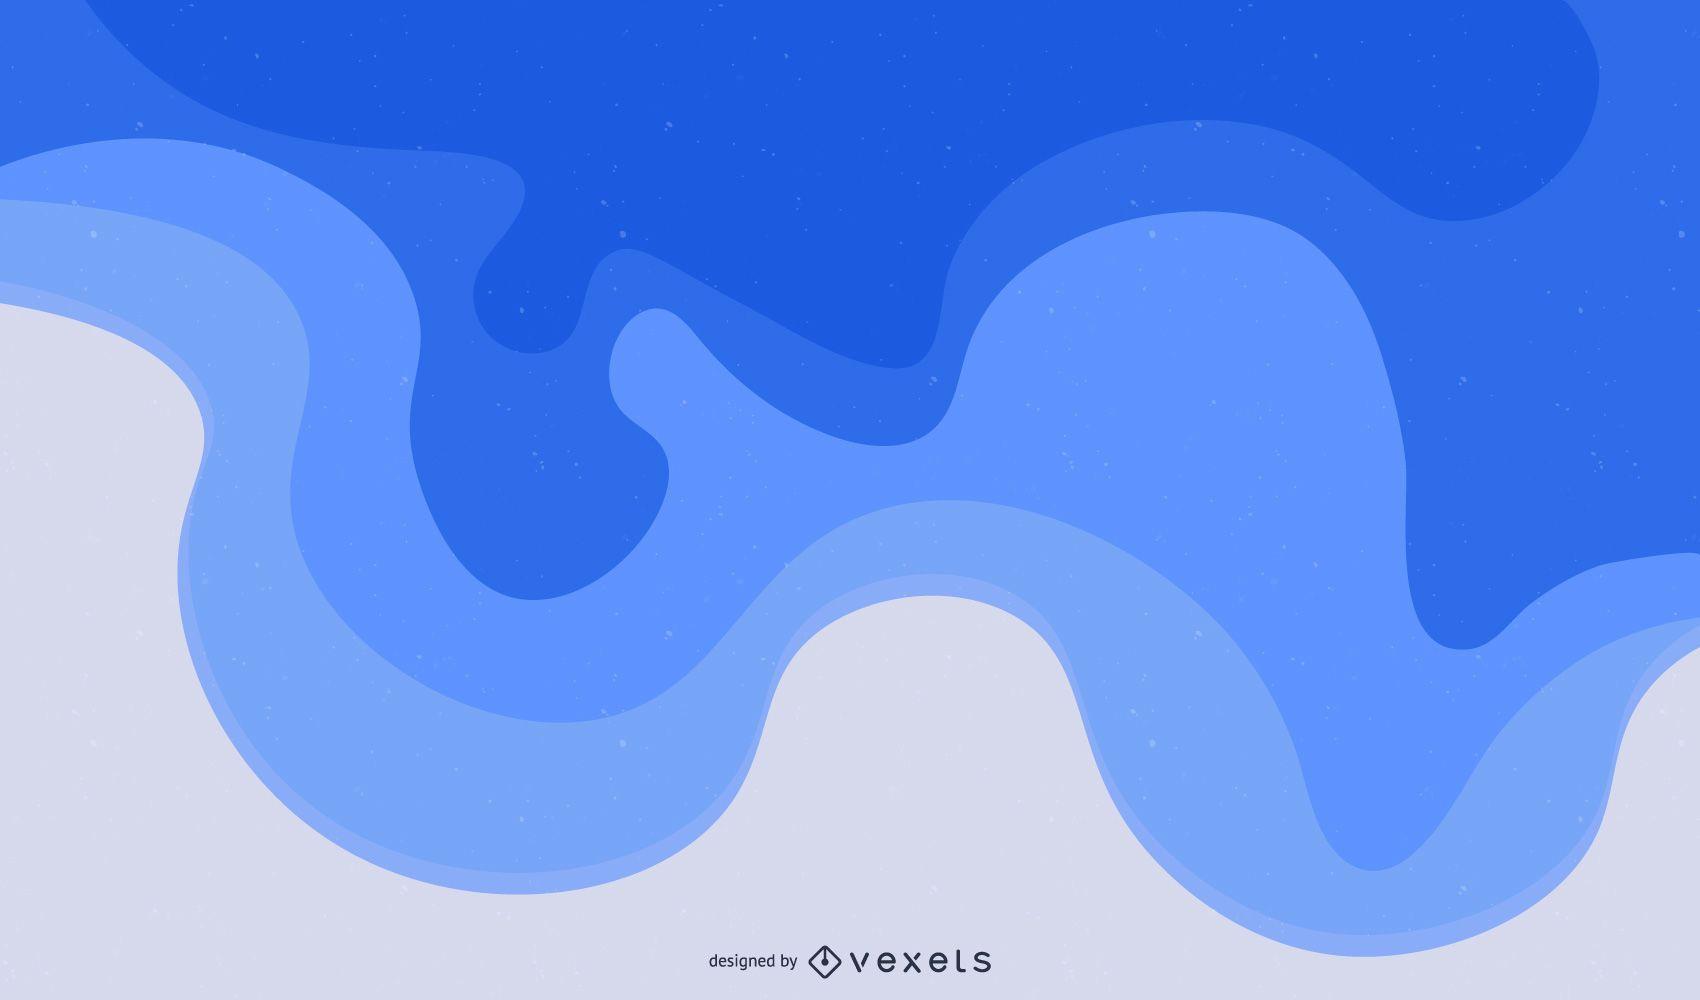 Curvy Cutting Edge Blue Waves Background